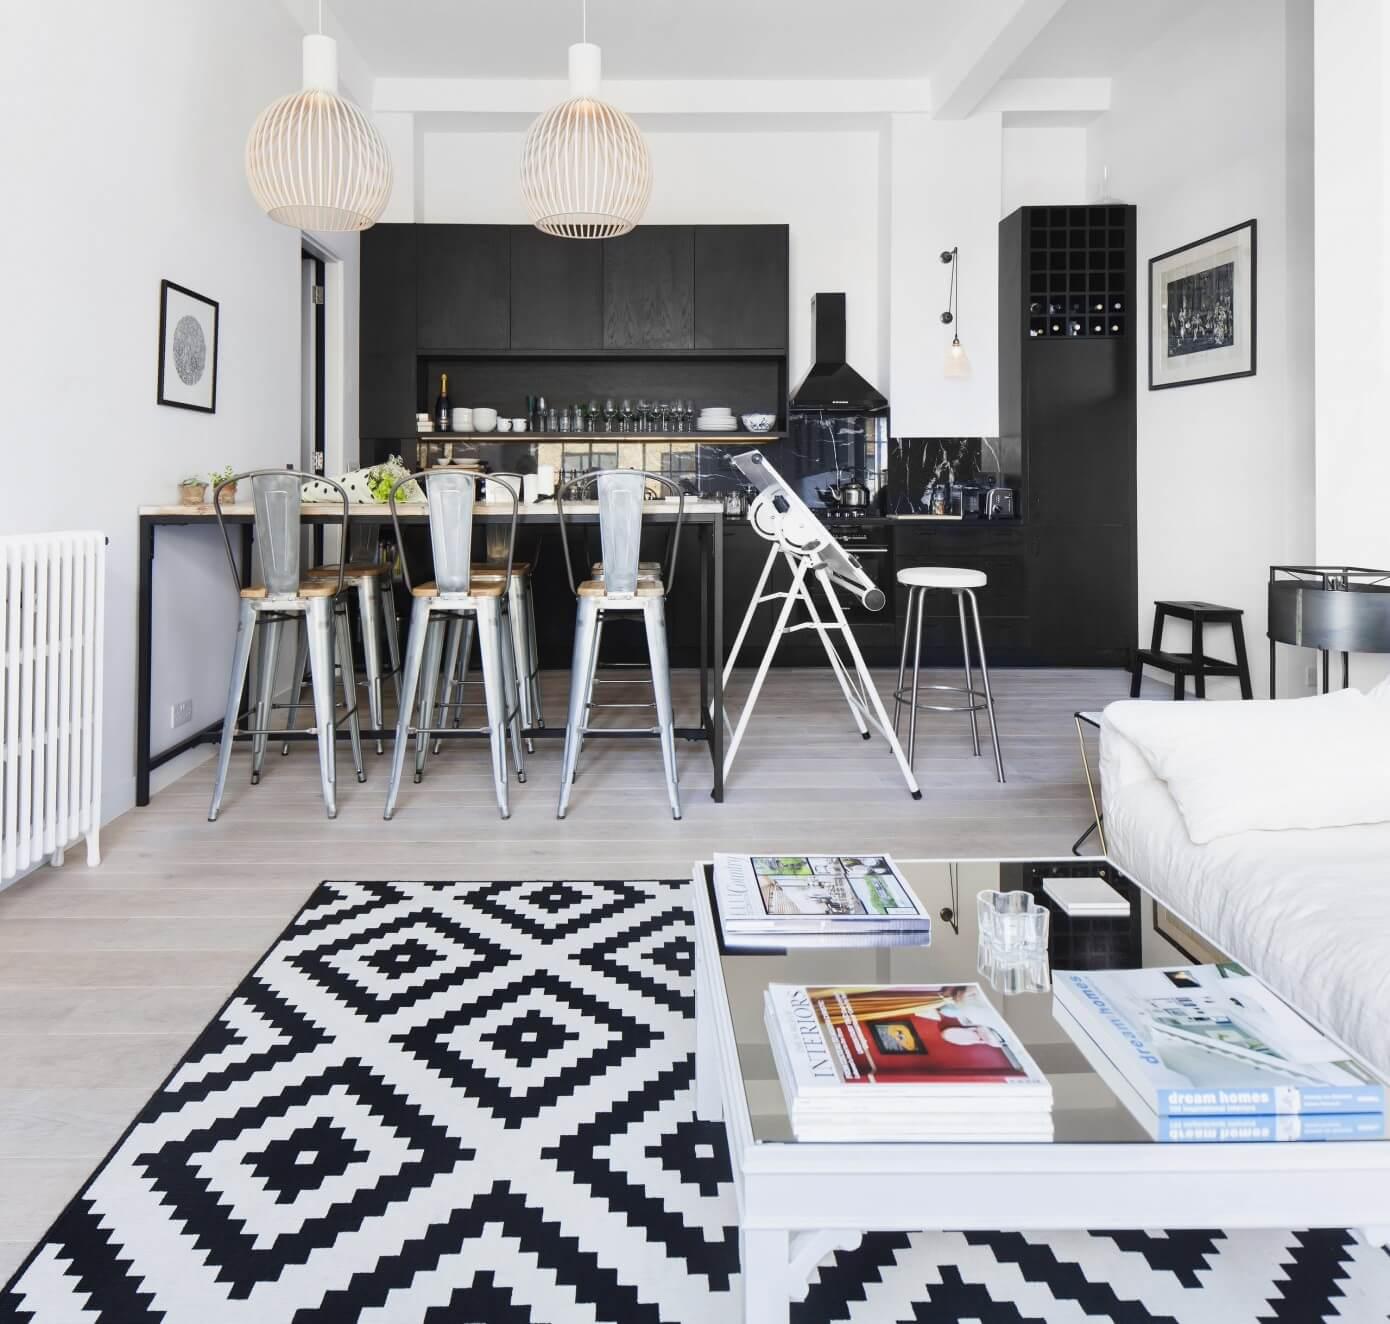 Loft Apartment By Laura Lakin Design « HomeAdore